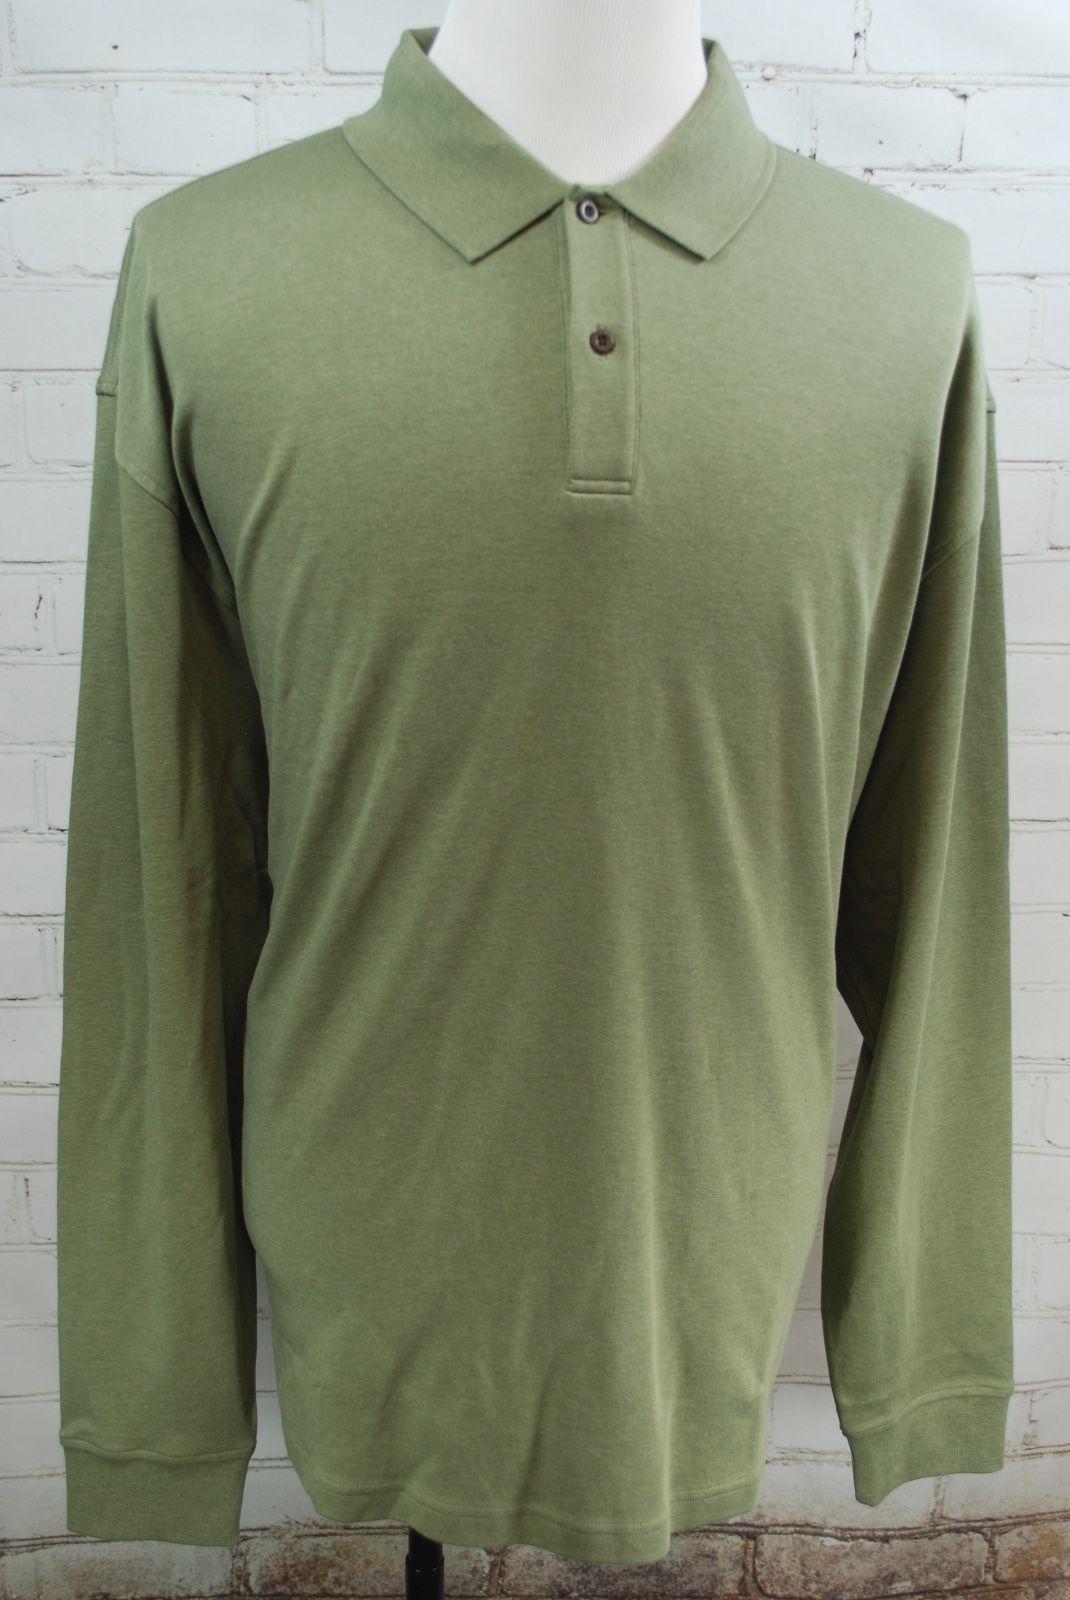 d626afcb2e6 Orvis Signature Men's Long Sleeve Polo Shirt and 11 similar items. 57